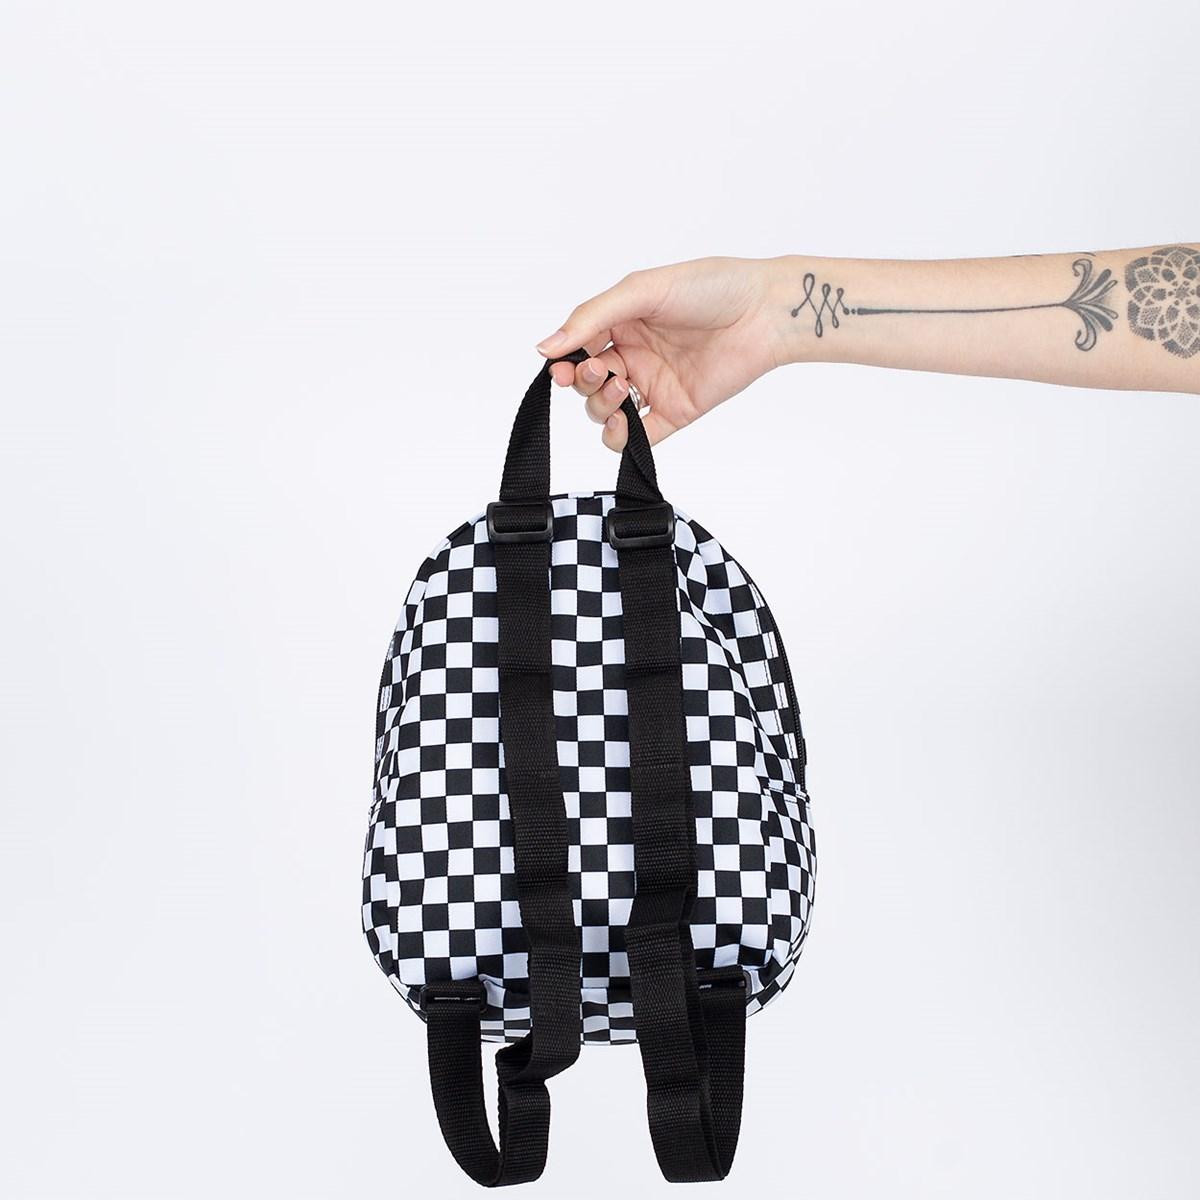 Mochila Vans Got This Mini Backpack Black White Checkerboard VN0A3Z7W56M